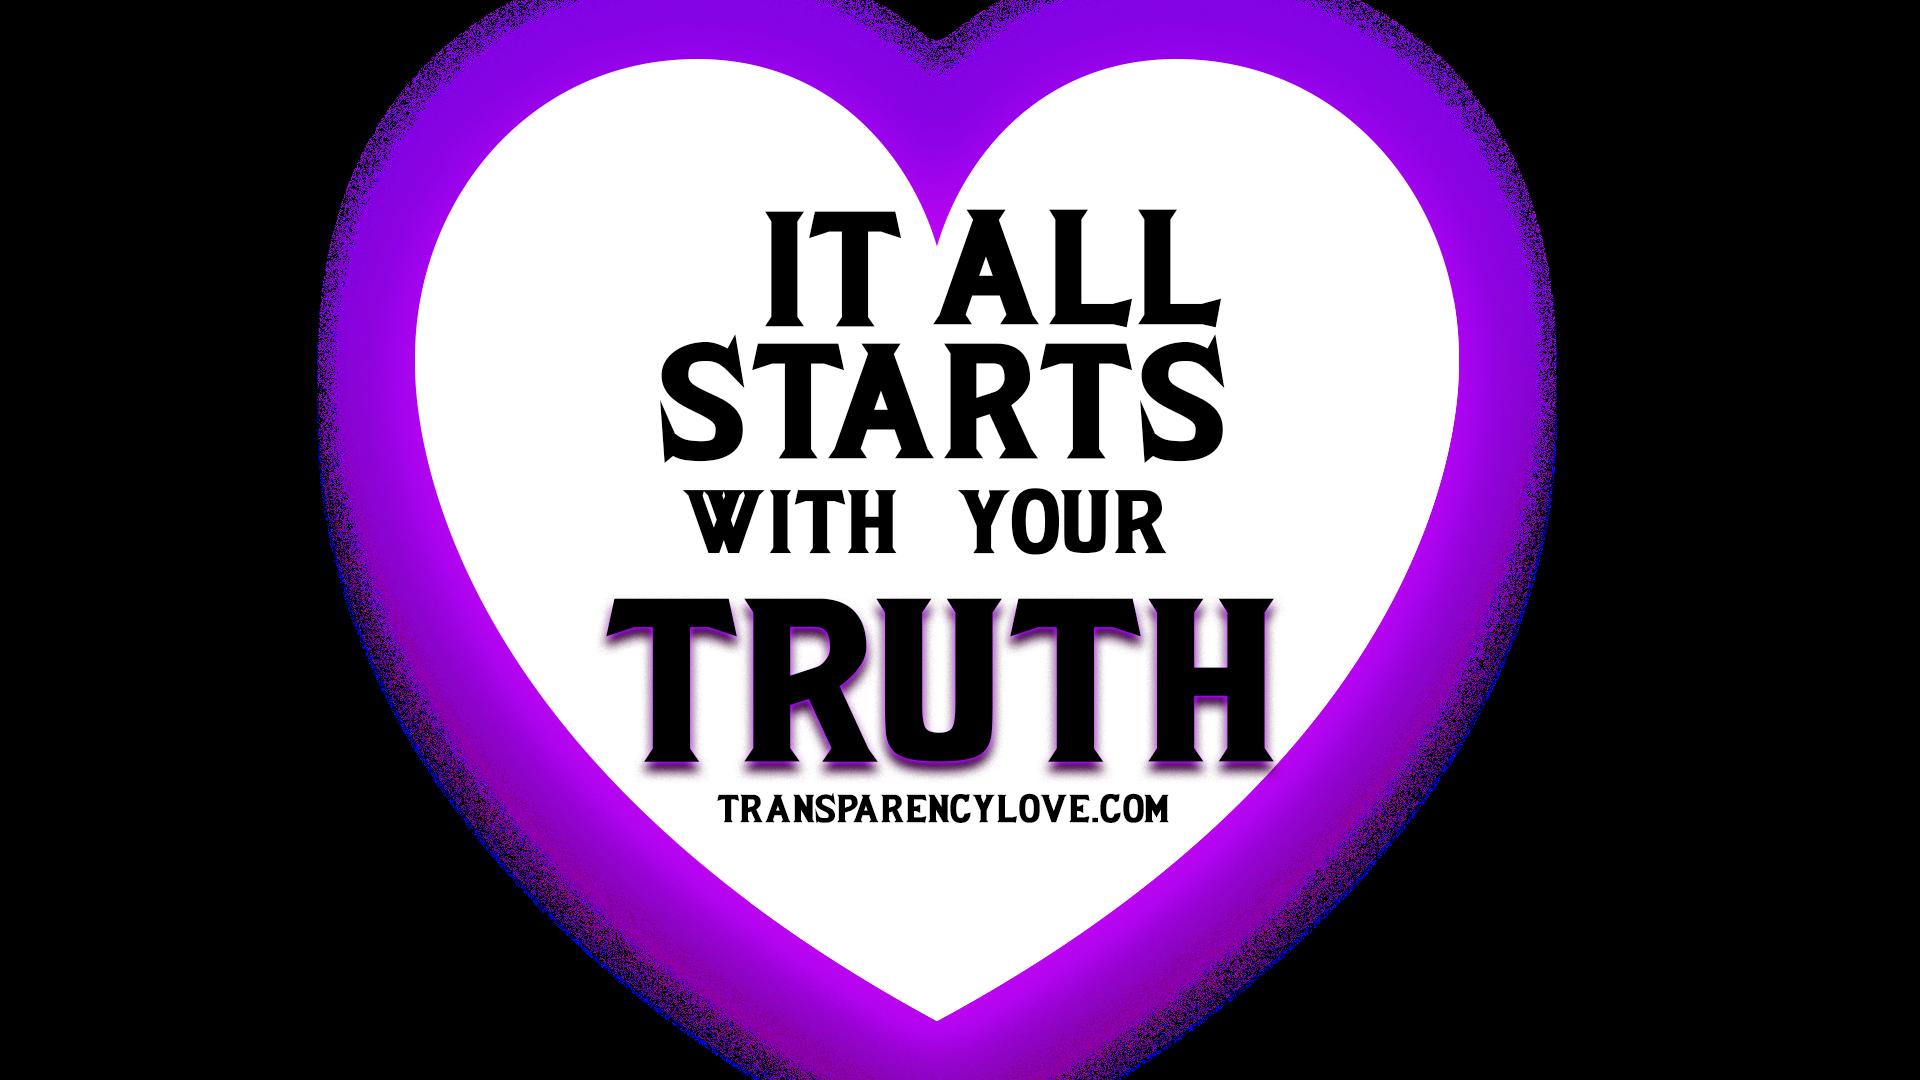 Transparency Love